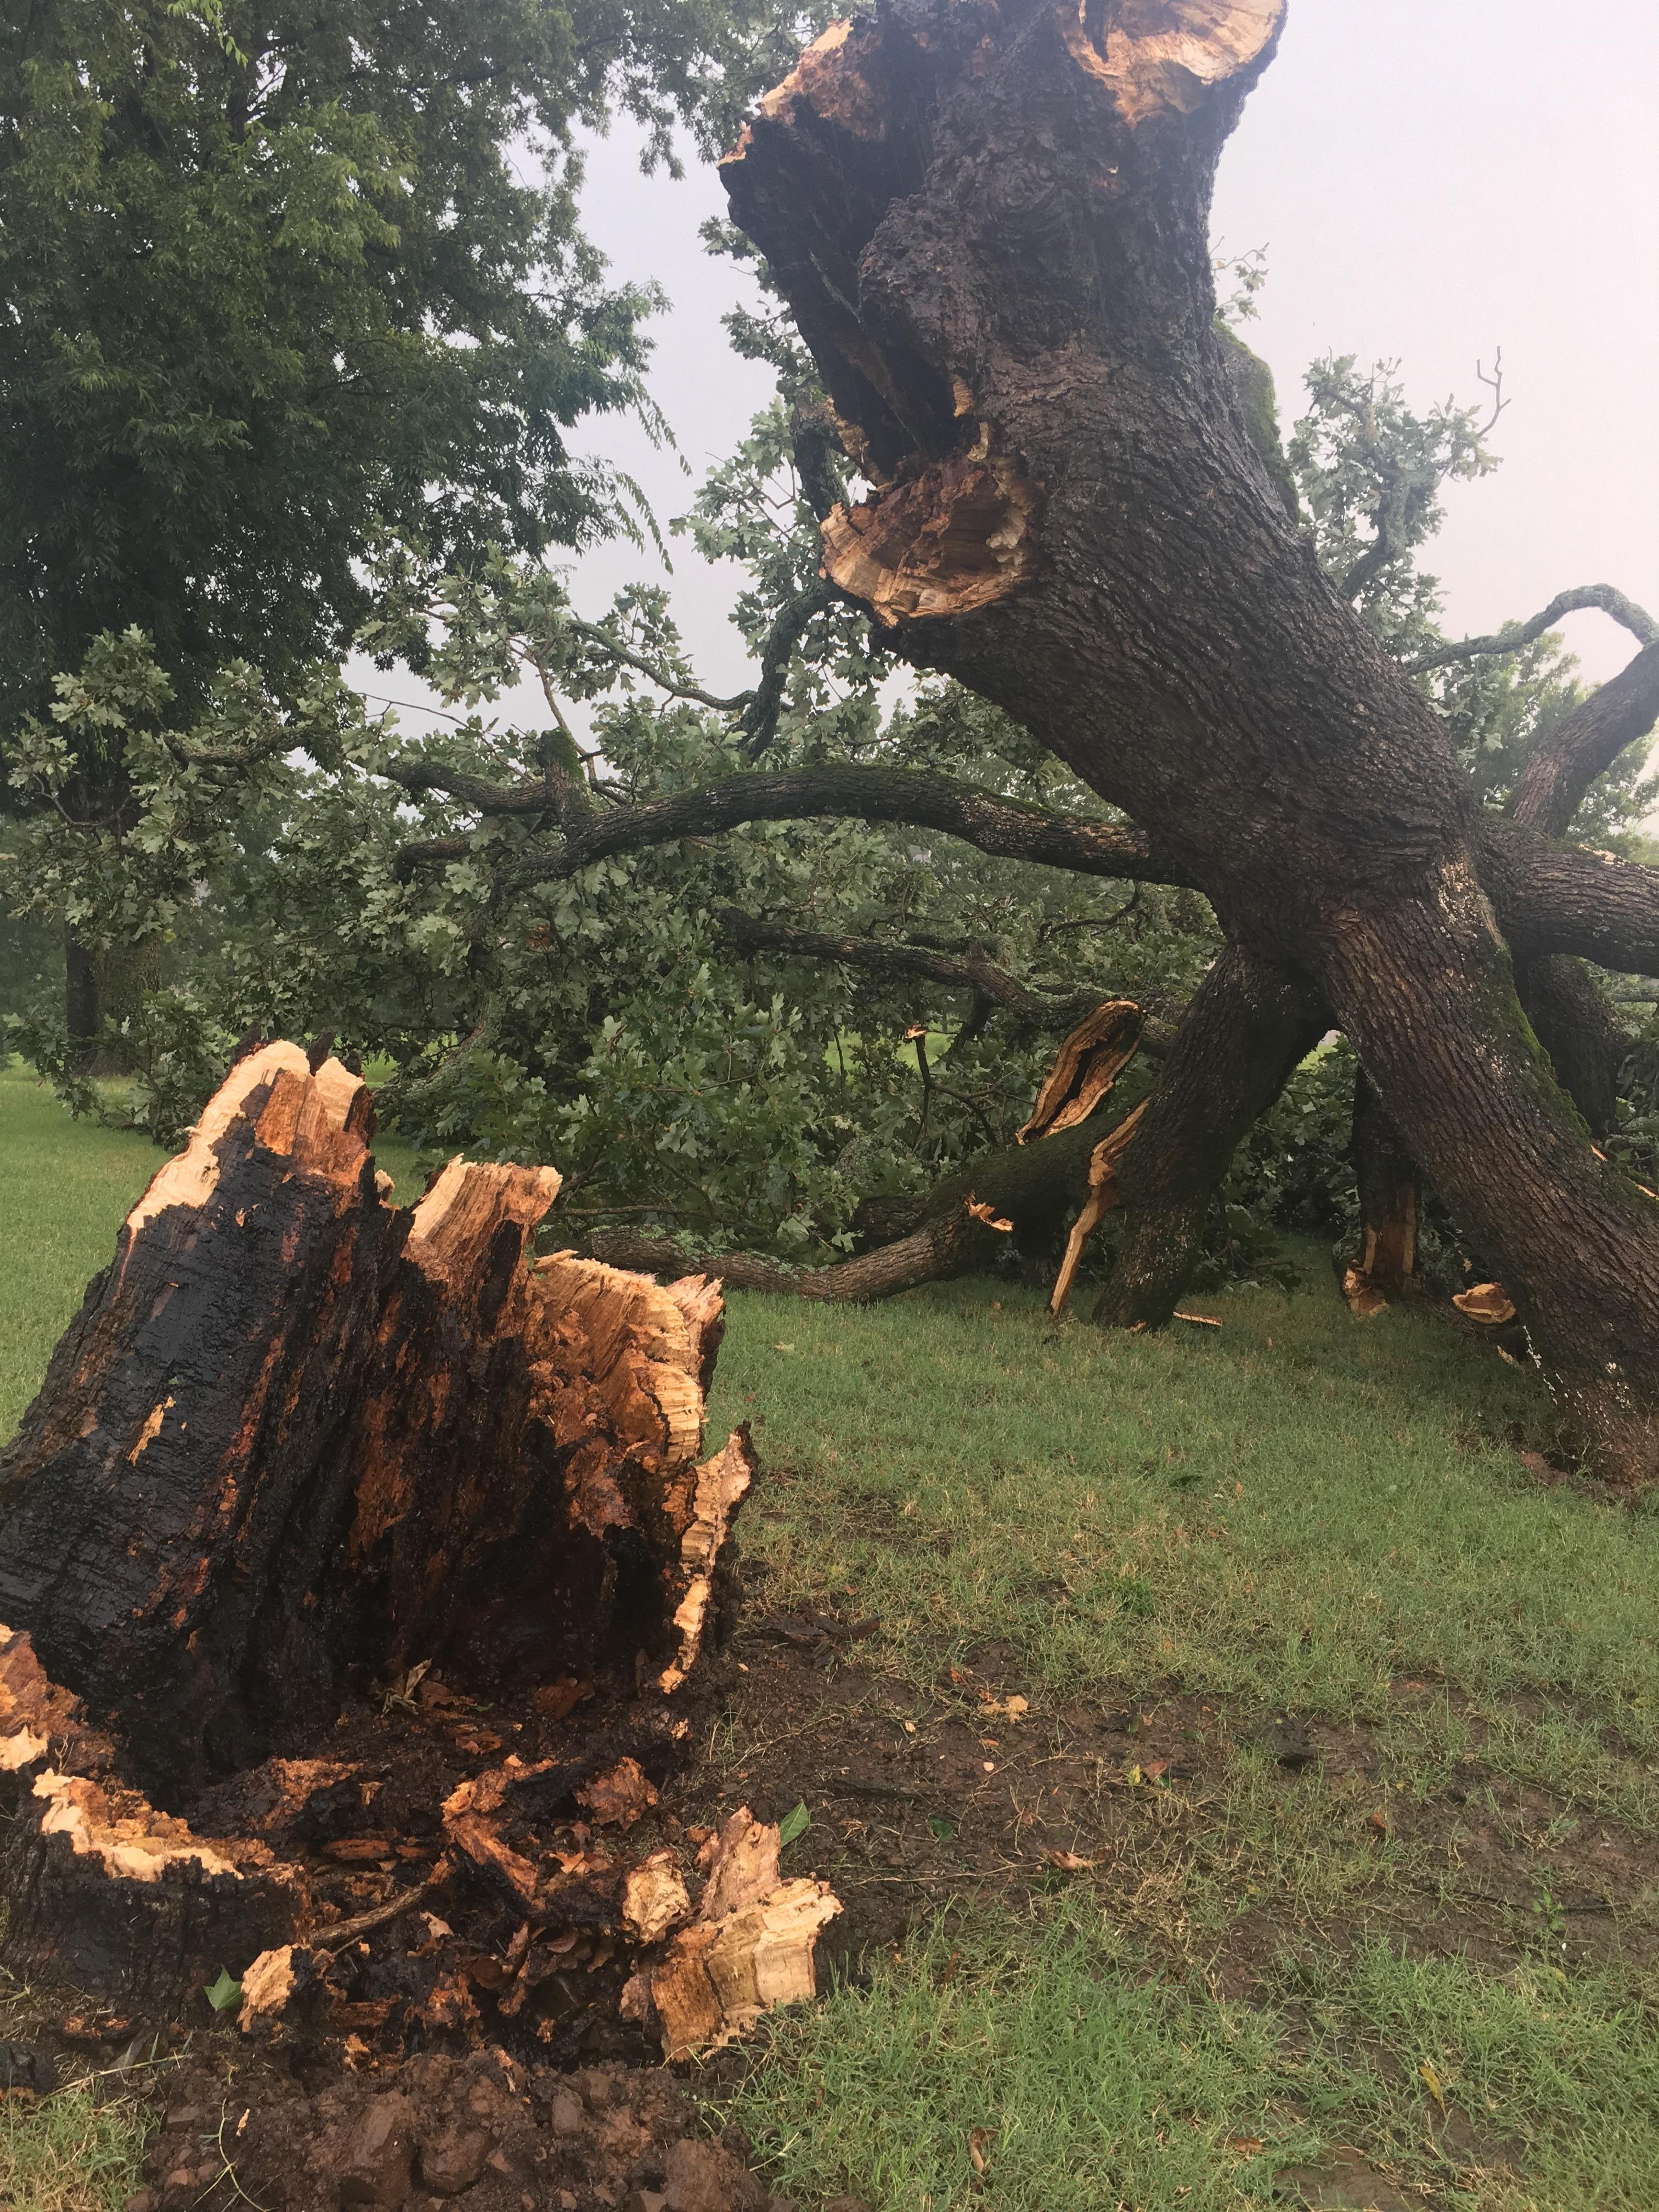 Van Buren, old oak tree fell during the storms.  Courtesy Melissa.